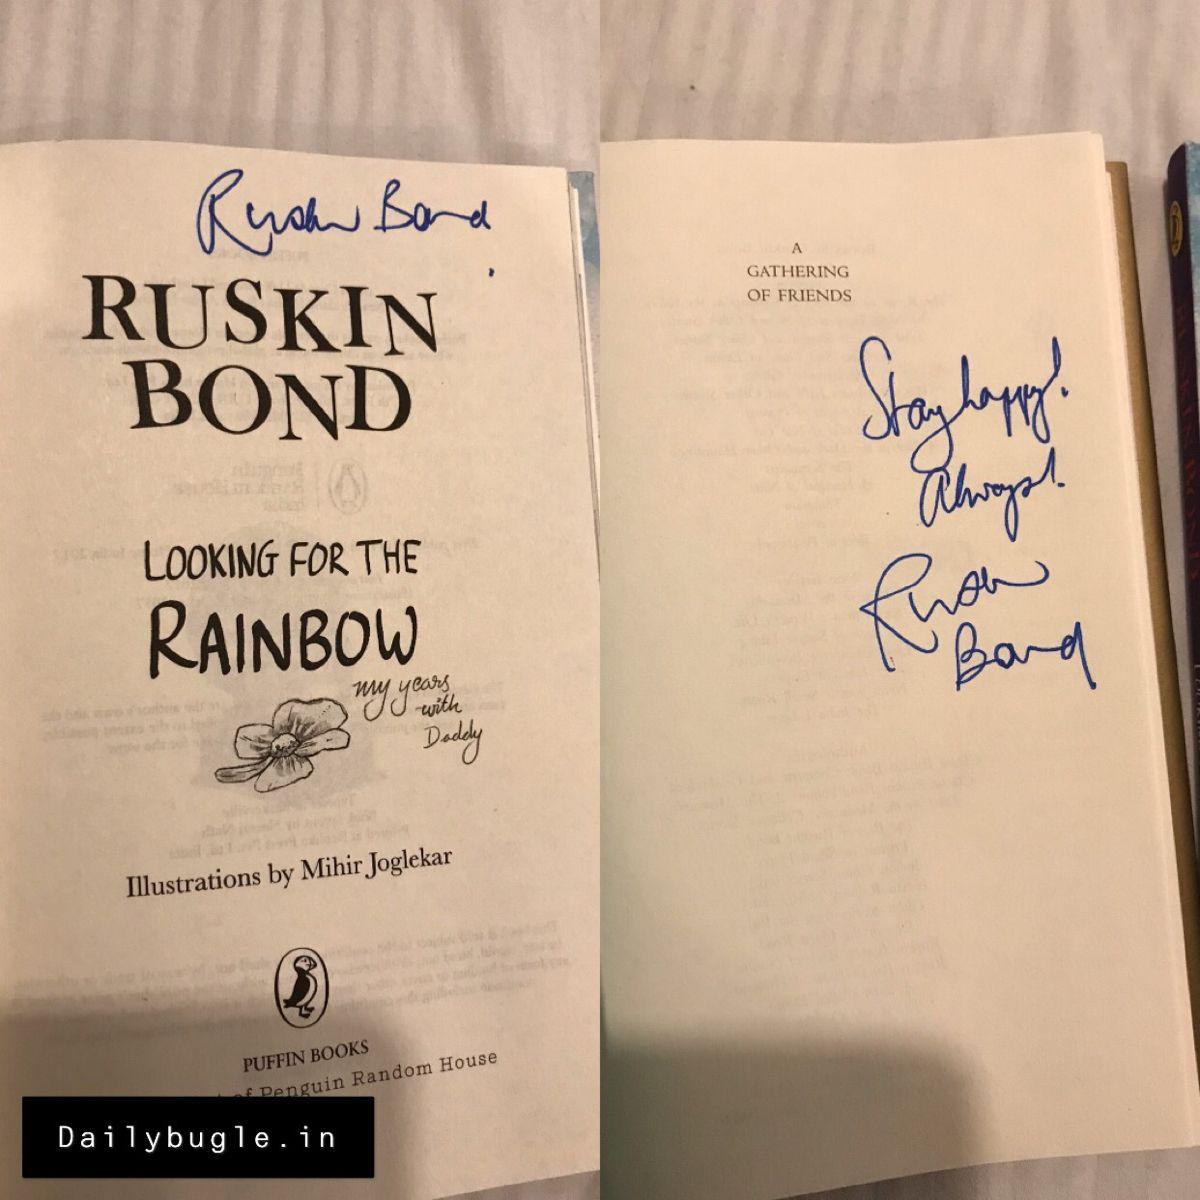 Ruskin Bond Books In 2020 Ruskin Bond Cambridge Book Book Lists